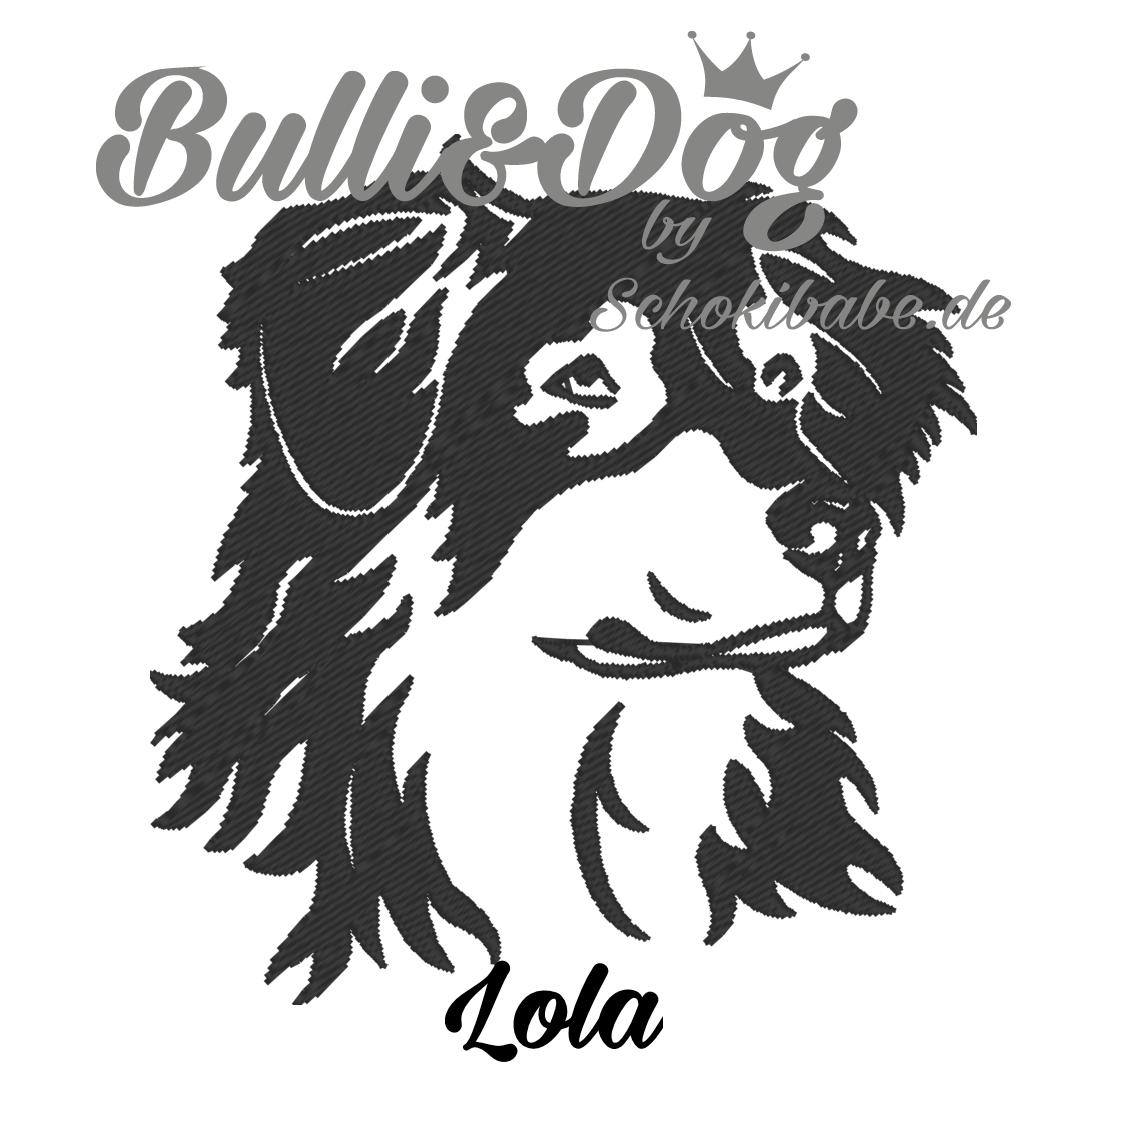 Lola_7x7-3-Kopie5b5c22fd168ec